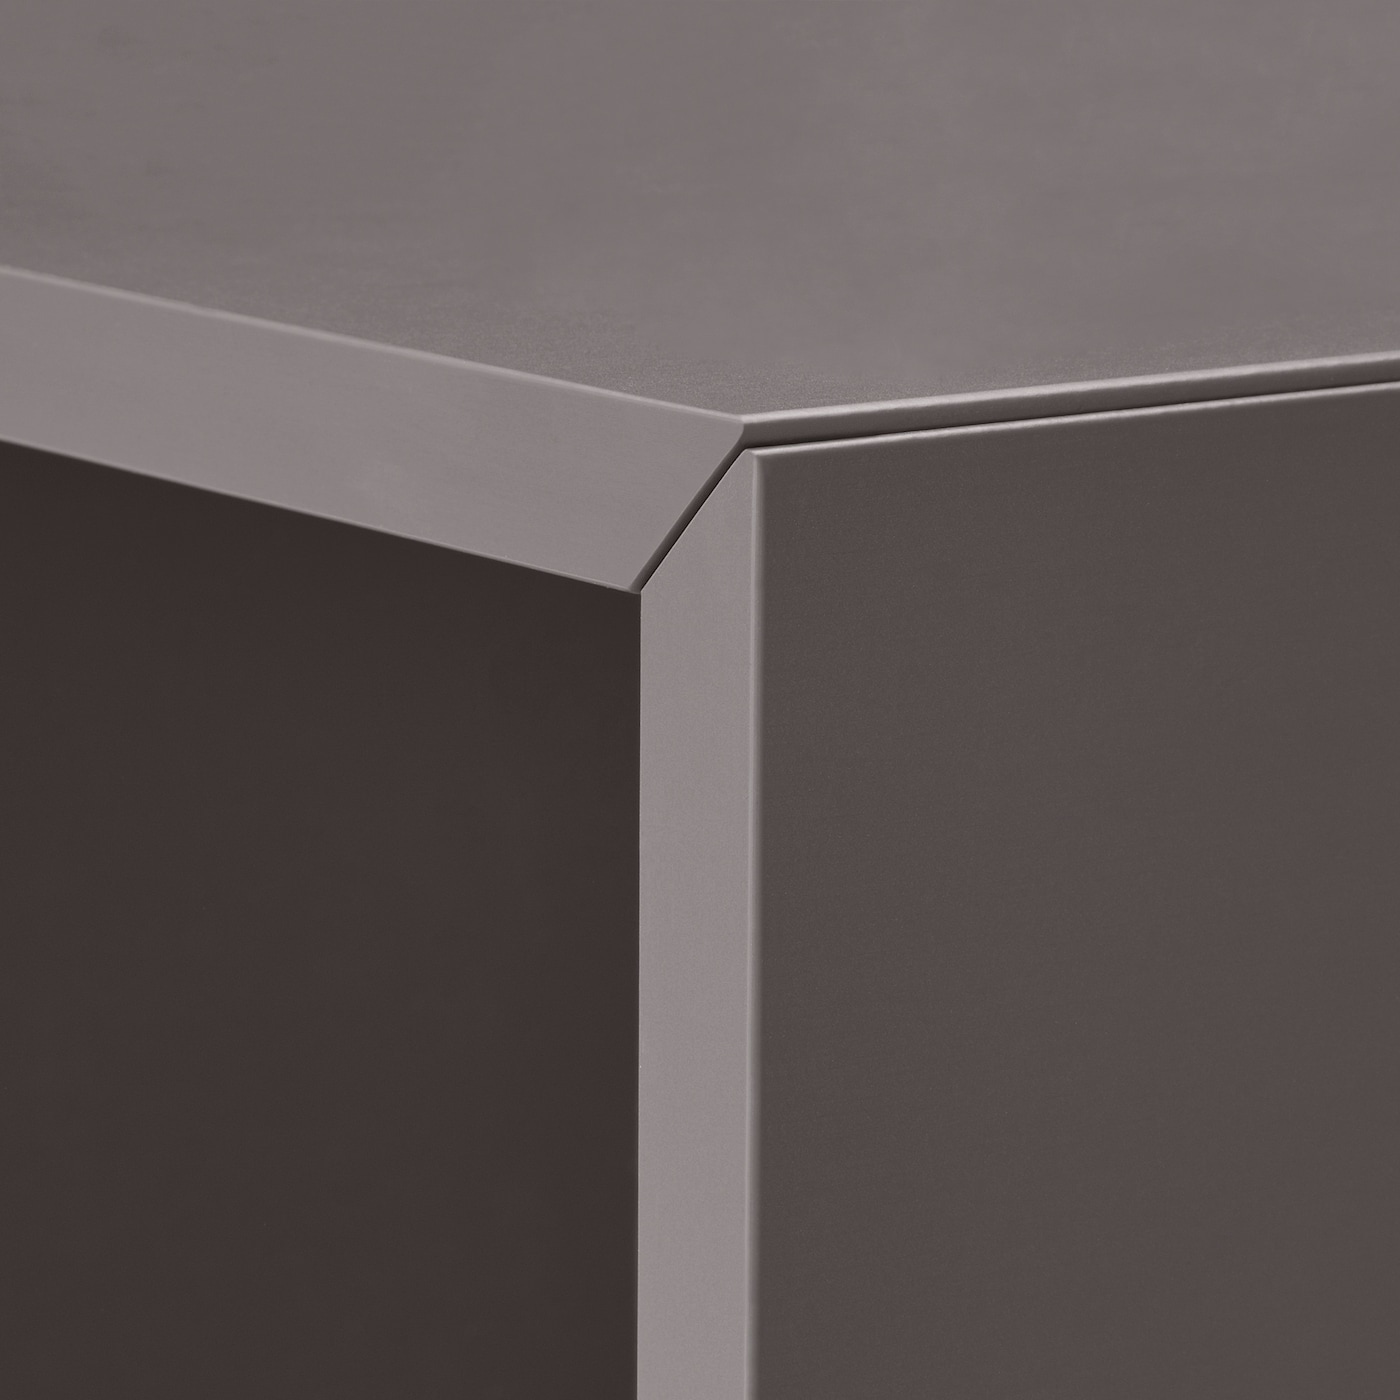 EKET skříňka tmavě šedá 35 cm 25 cm 35 cm 5 kg